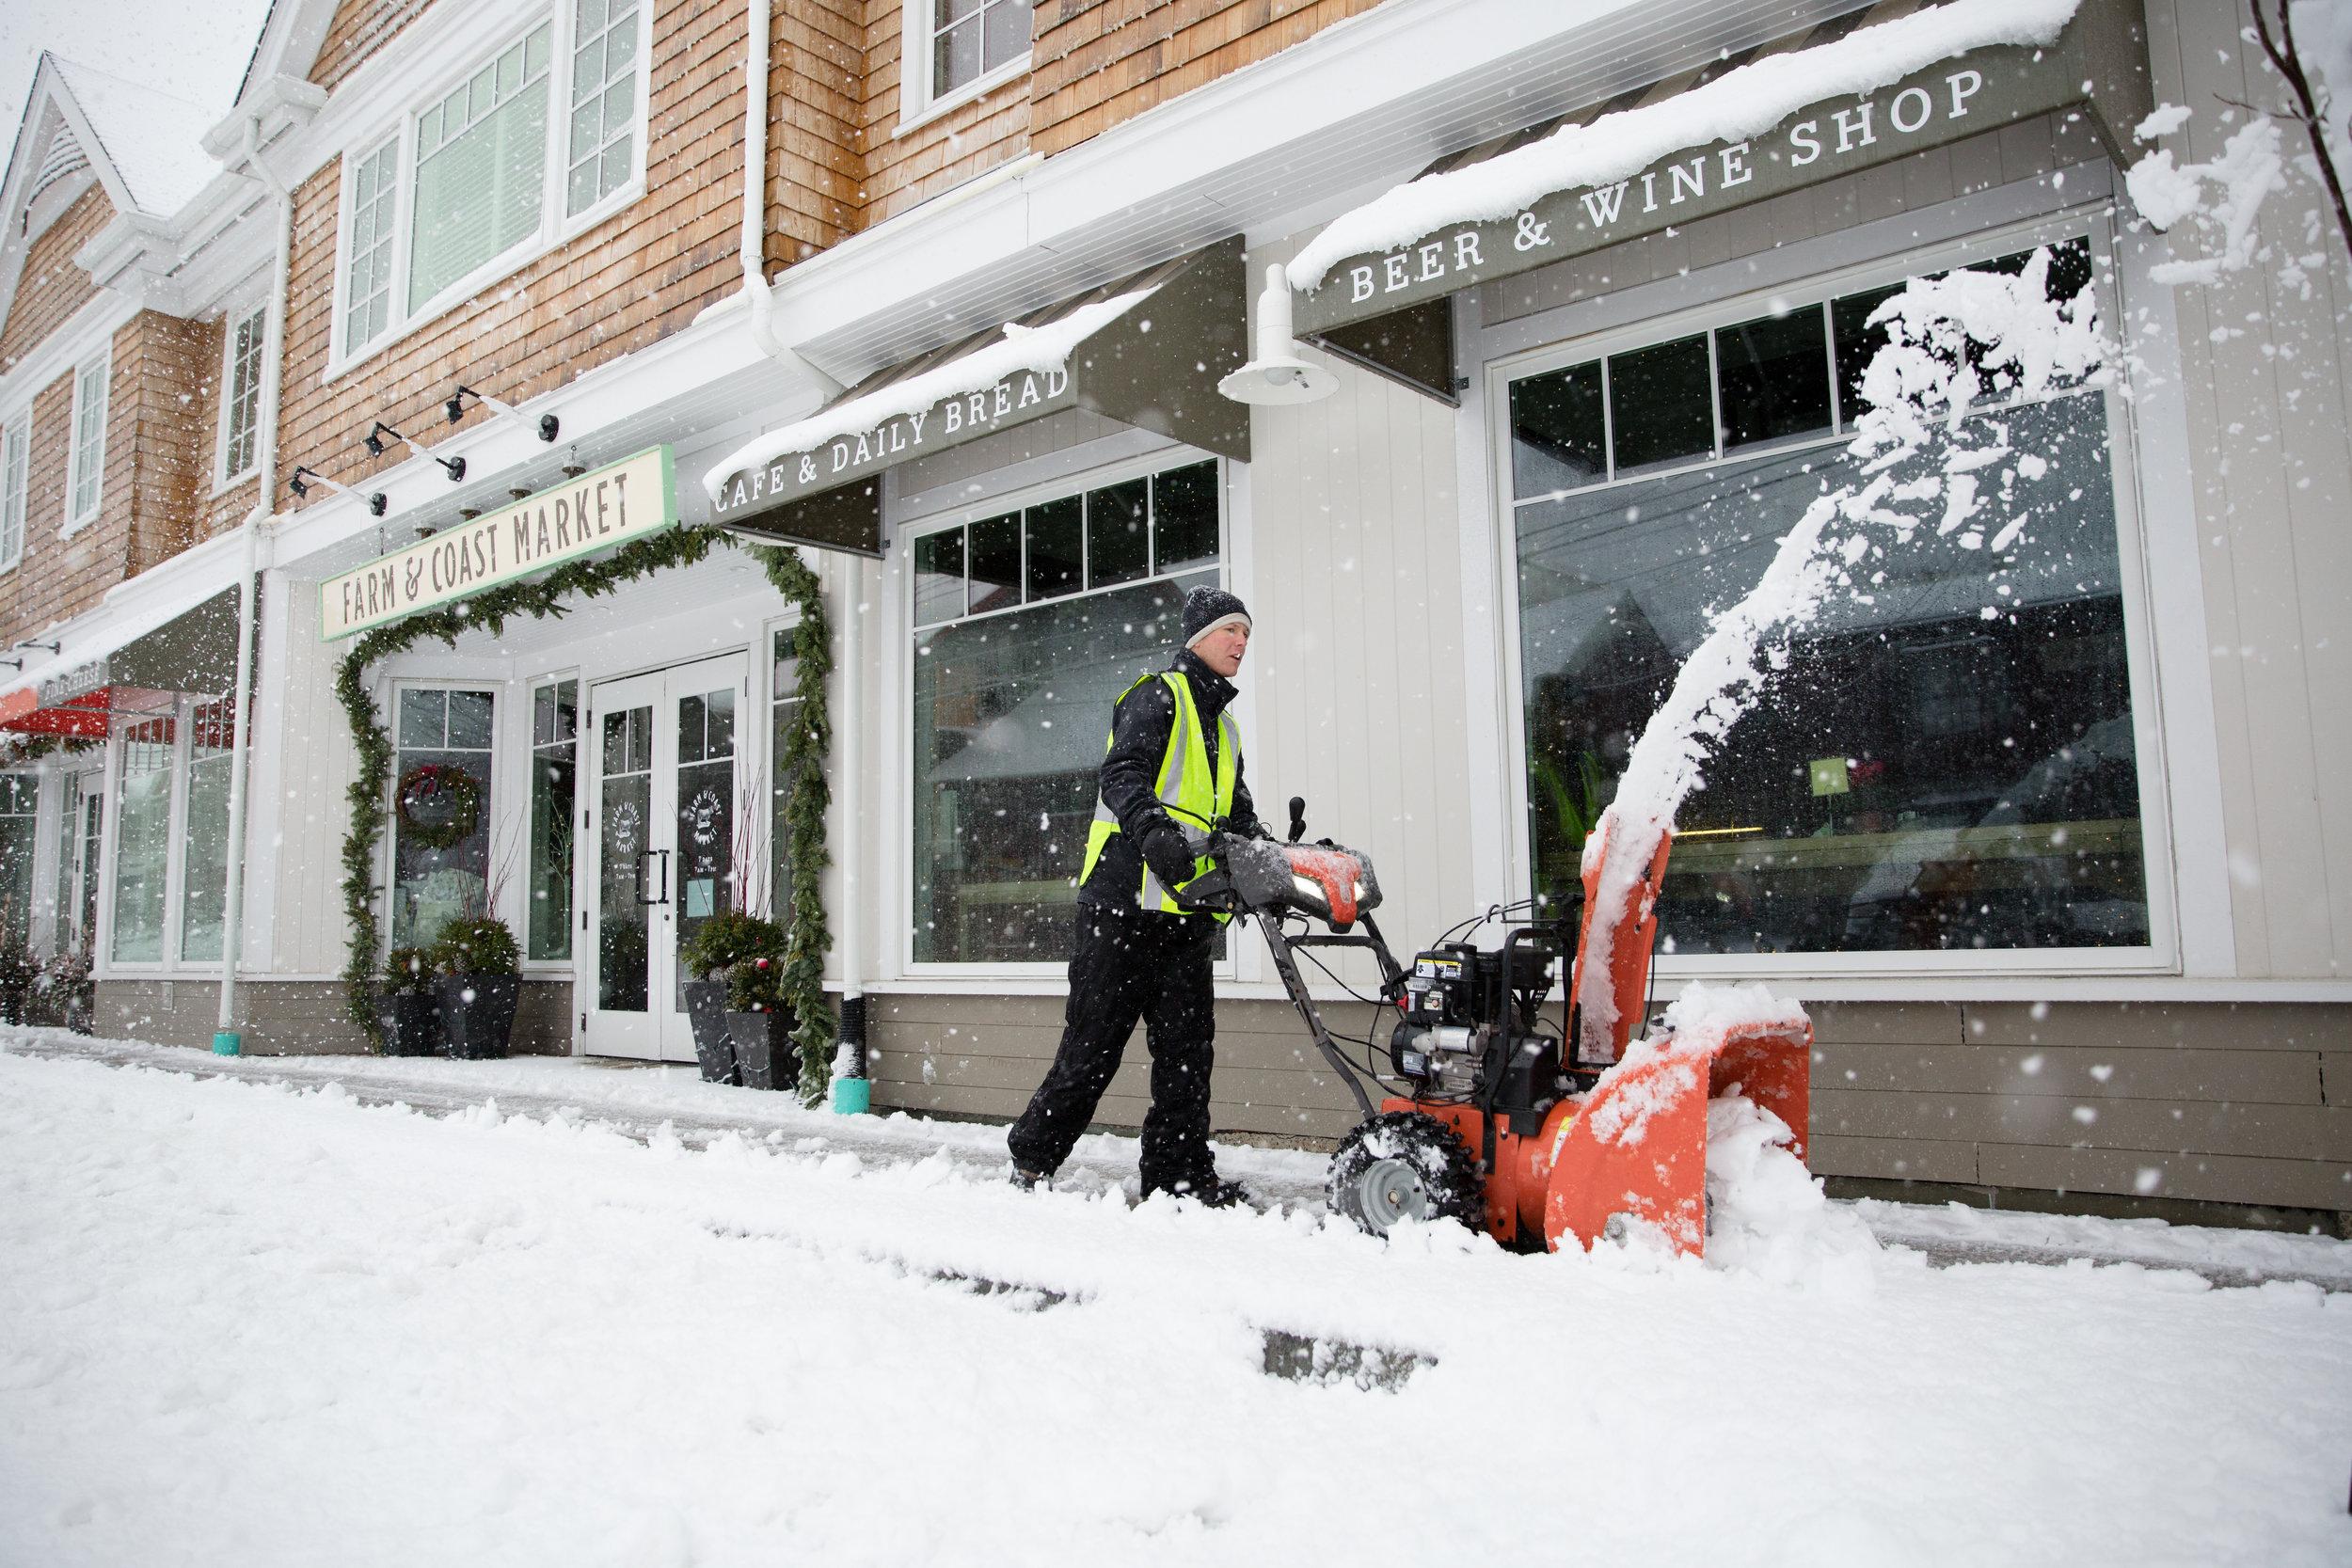 Ian Woodcock (Village Lawn Company, LLC.) moving that snow. - Padanaram Village